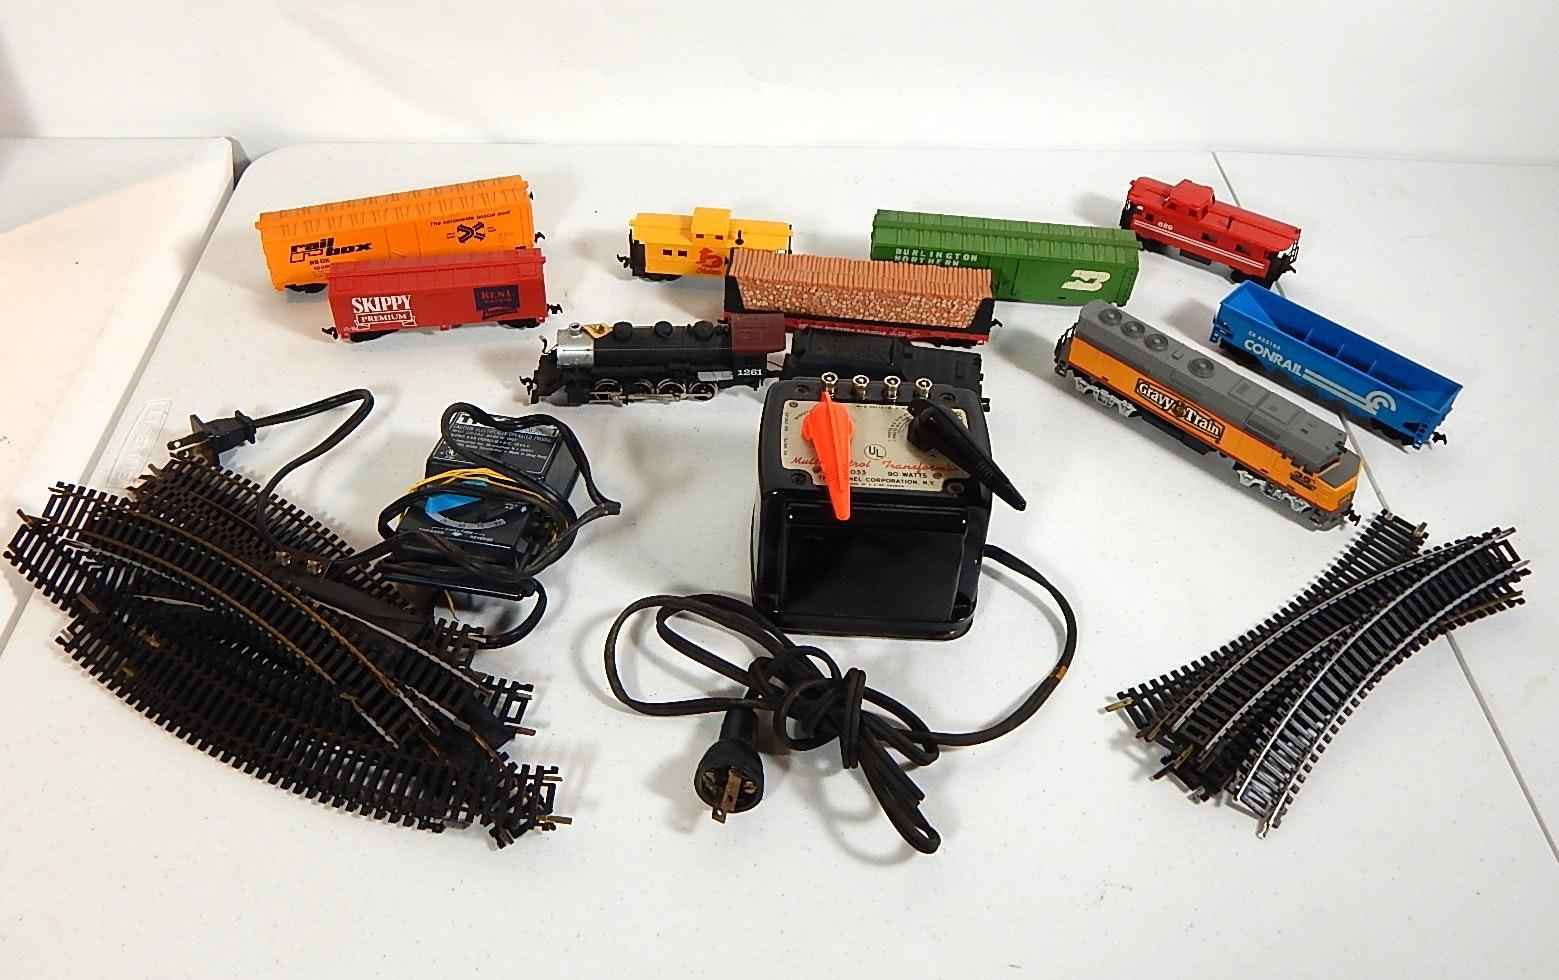 Ho Track Wiring To Transformer Diagram Fuse Box Scale Train Cars Locomotive And Tracks Ebth Rh Com Kato